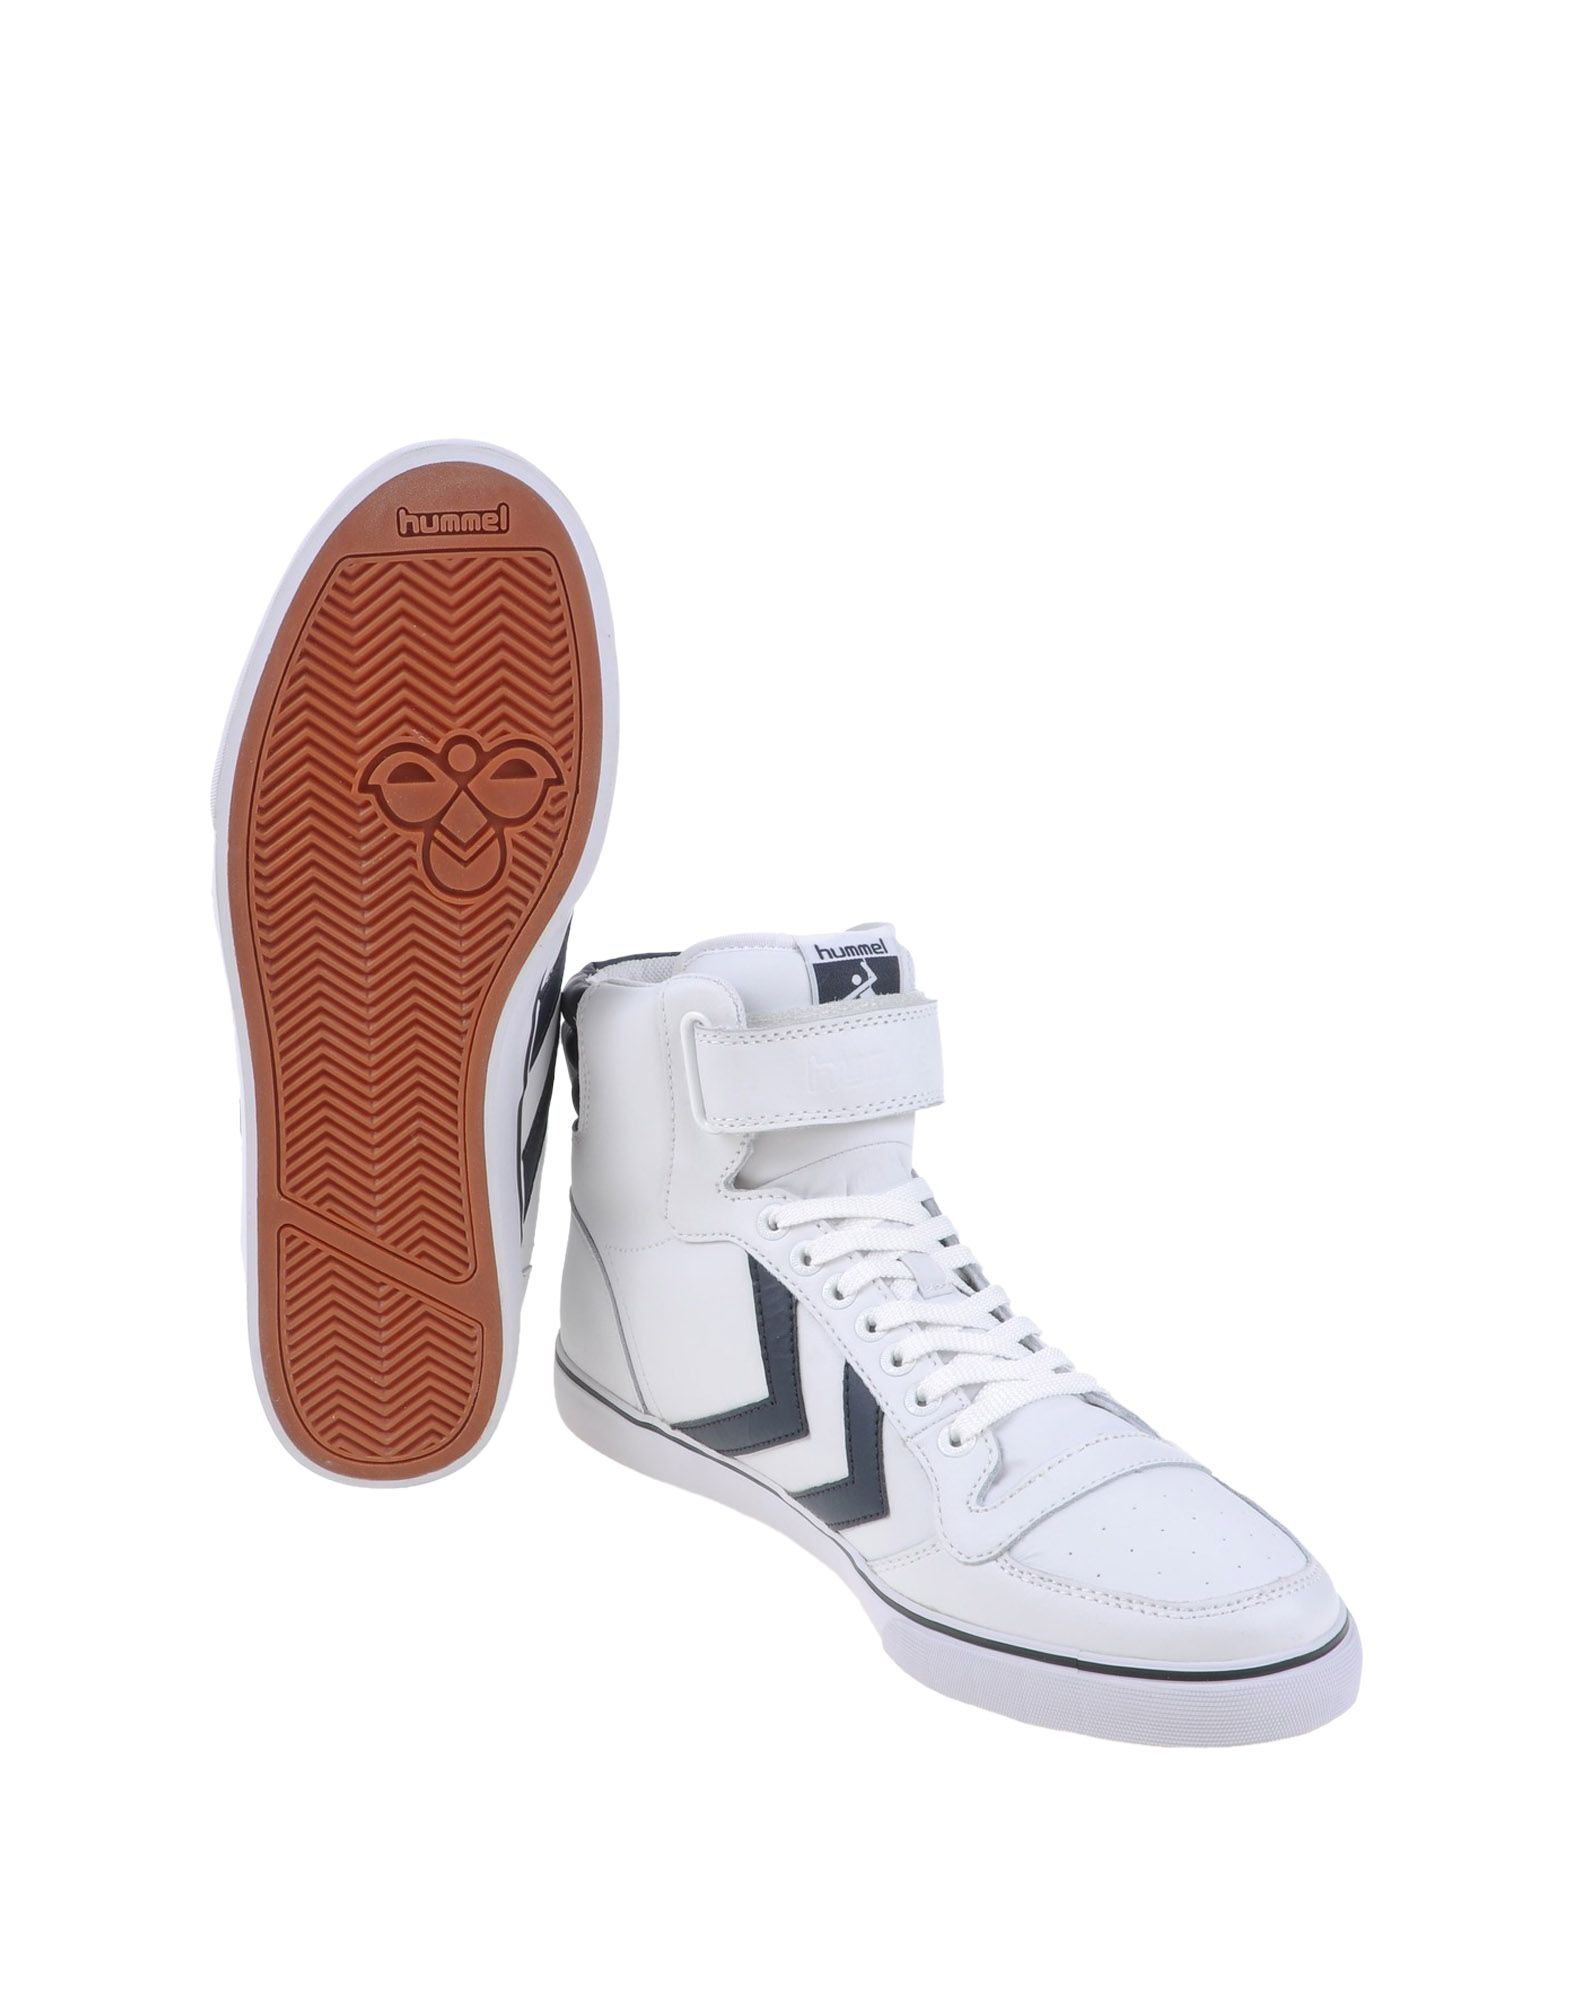 Sneakers Hummel Stadil Classic - Homme - Sneakers Hummel sur